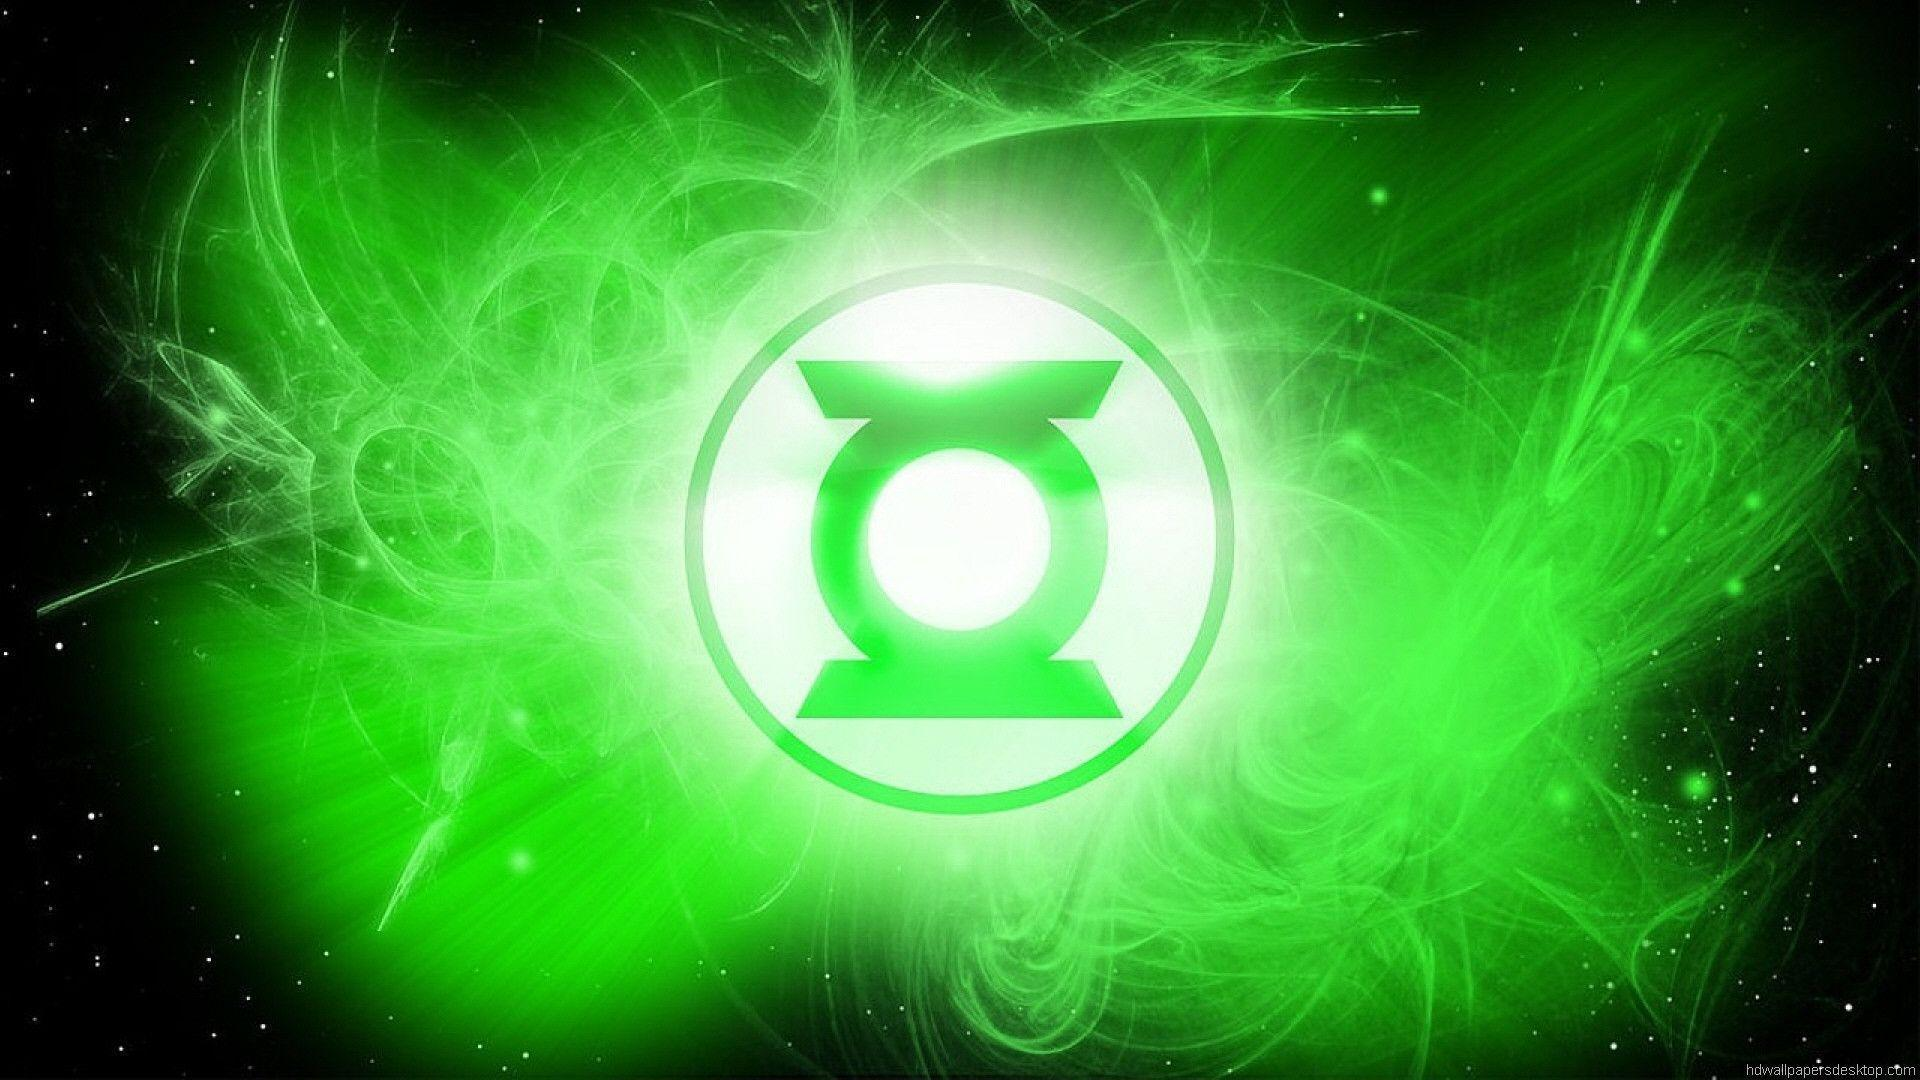 Green Lantern Phone Wallpapers Top Free Green Lantern Phone Backgrounds Wallpaperaccess